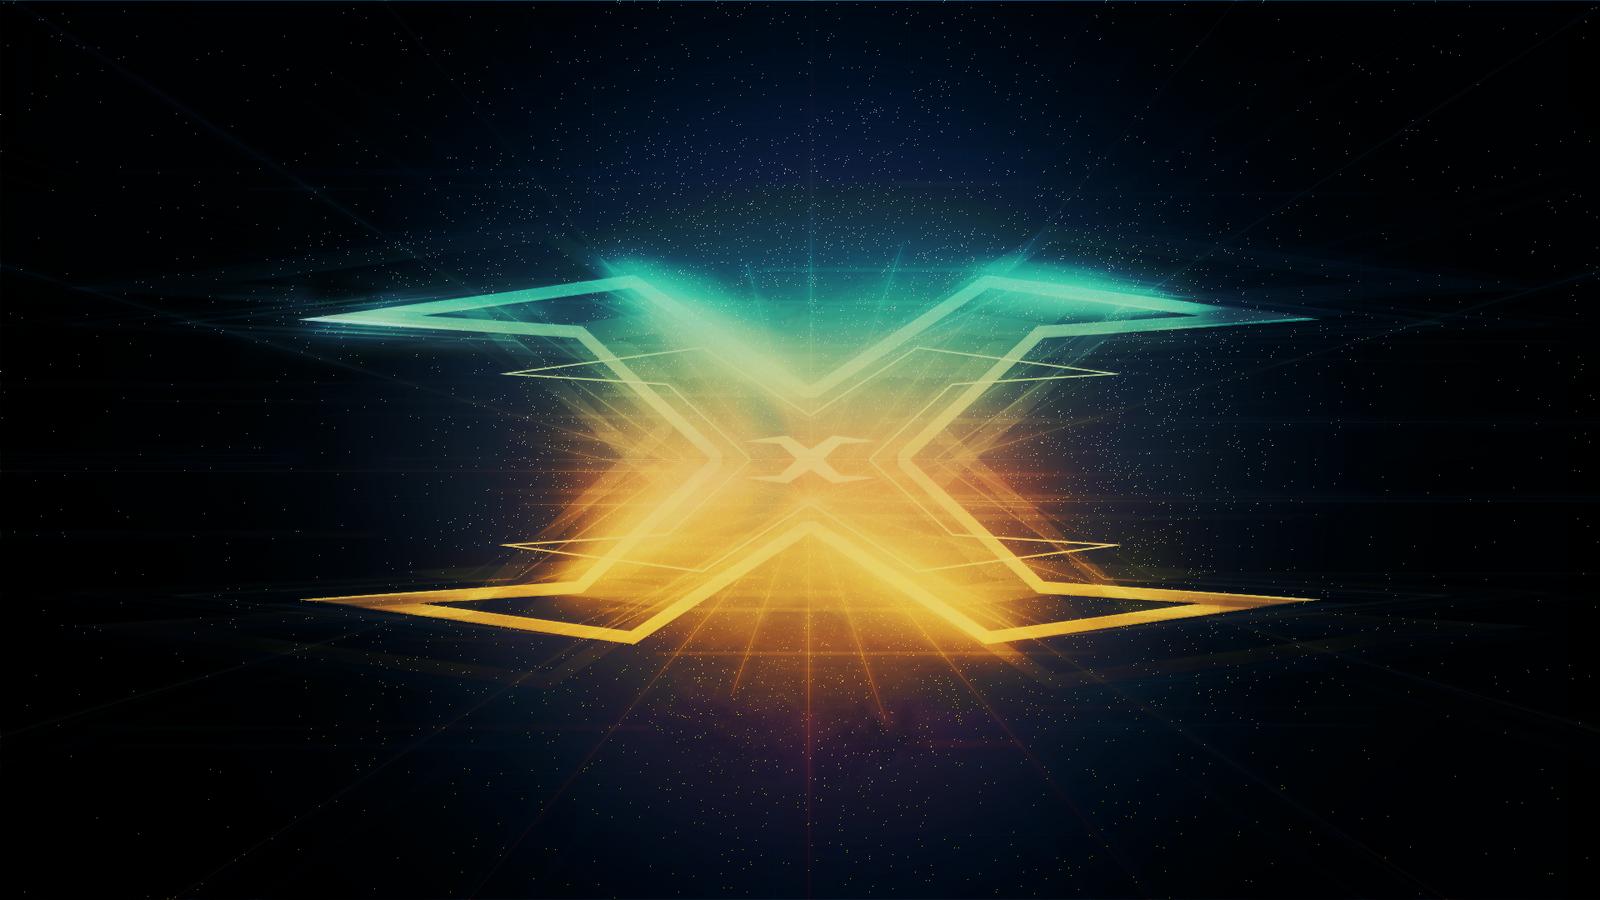 Wallpaper Ferox 2013 by IGORxREIS